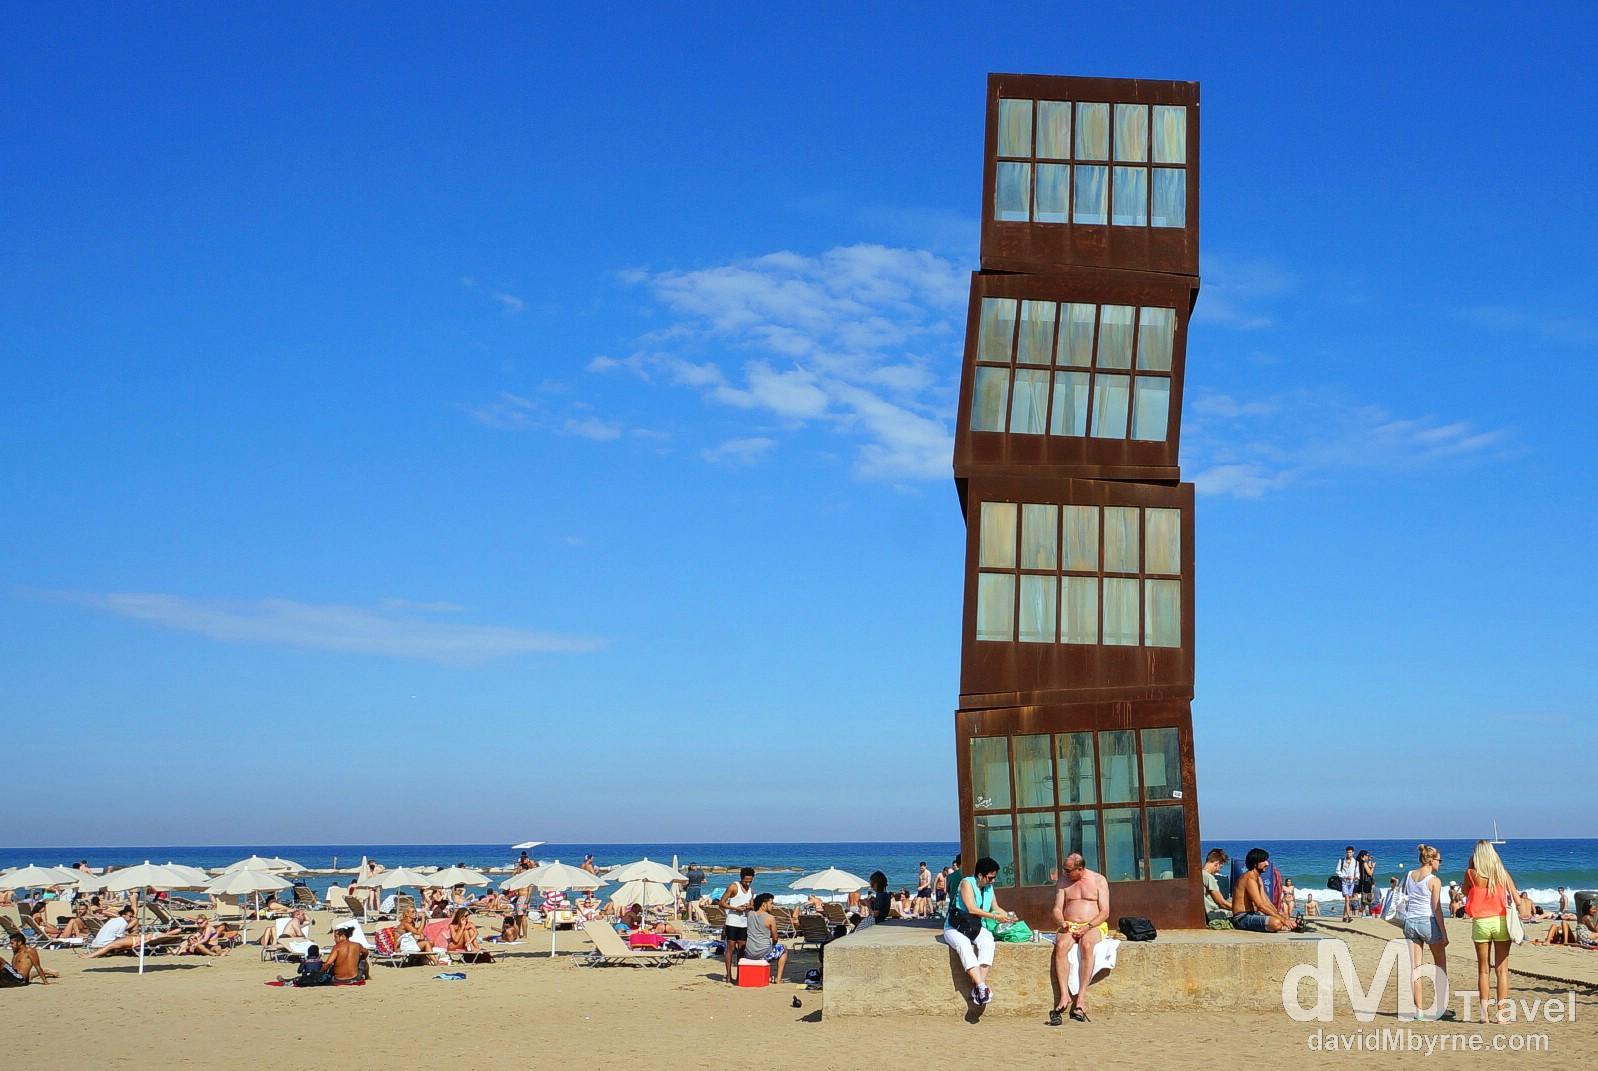 Platja de la Barceloneta, Barcelona, Spain. June 16th, 2014.